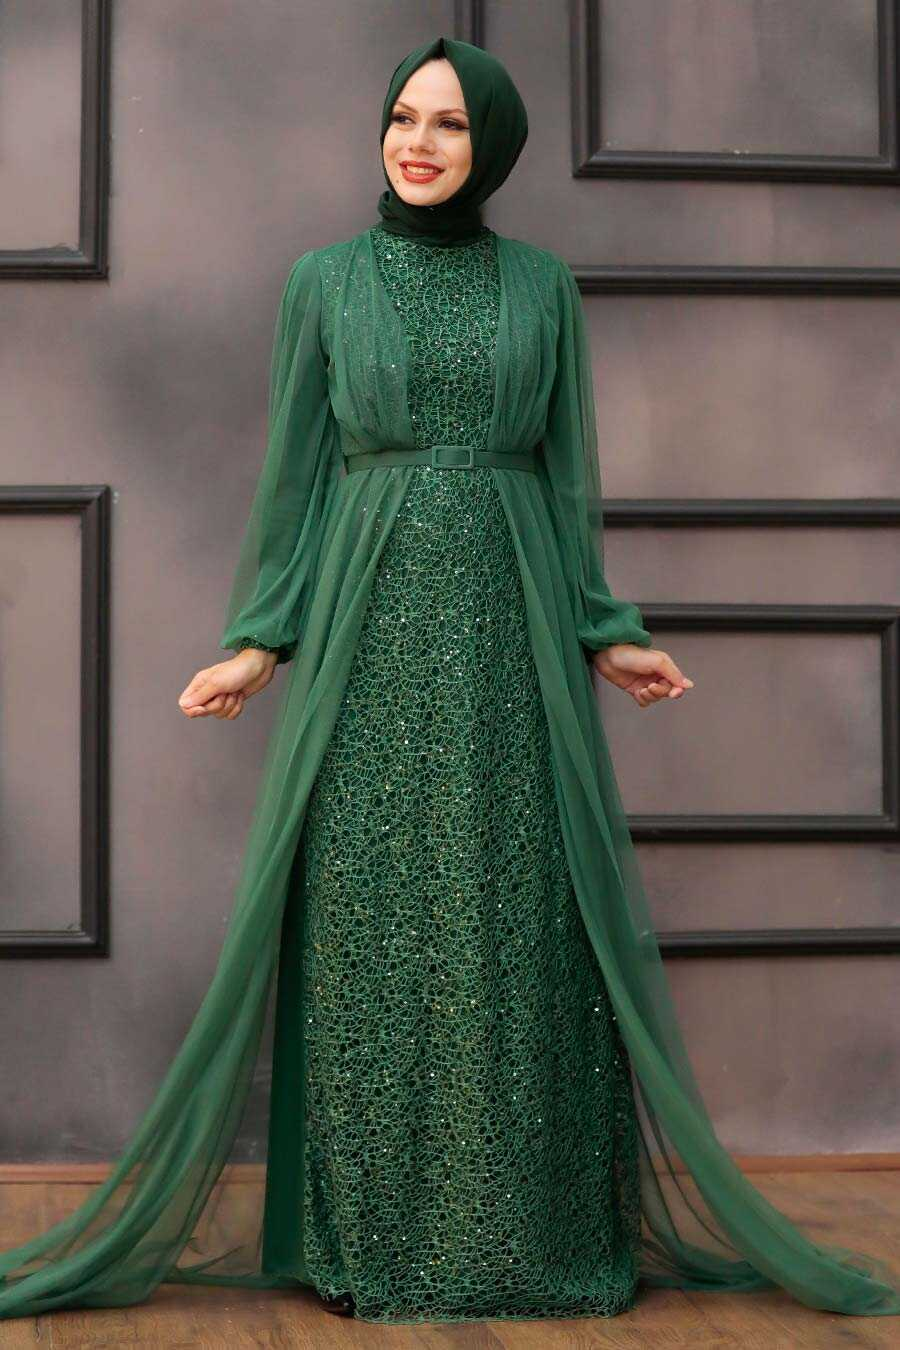 Green Hijab Evening Dress 5383Y